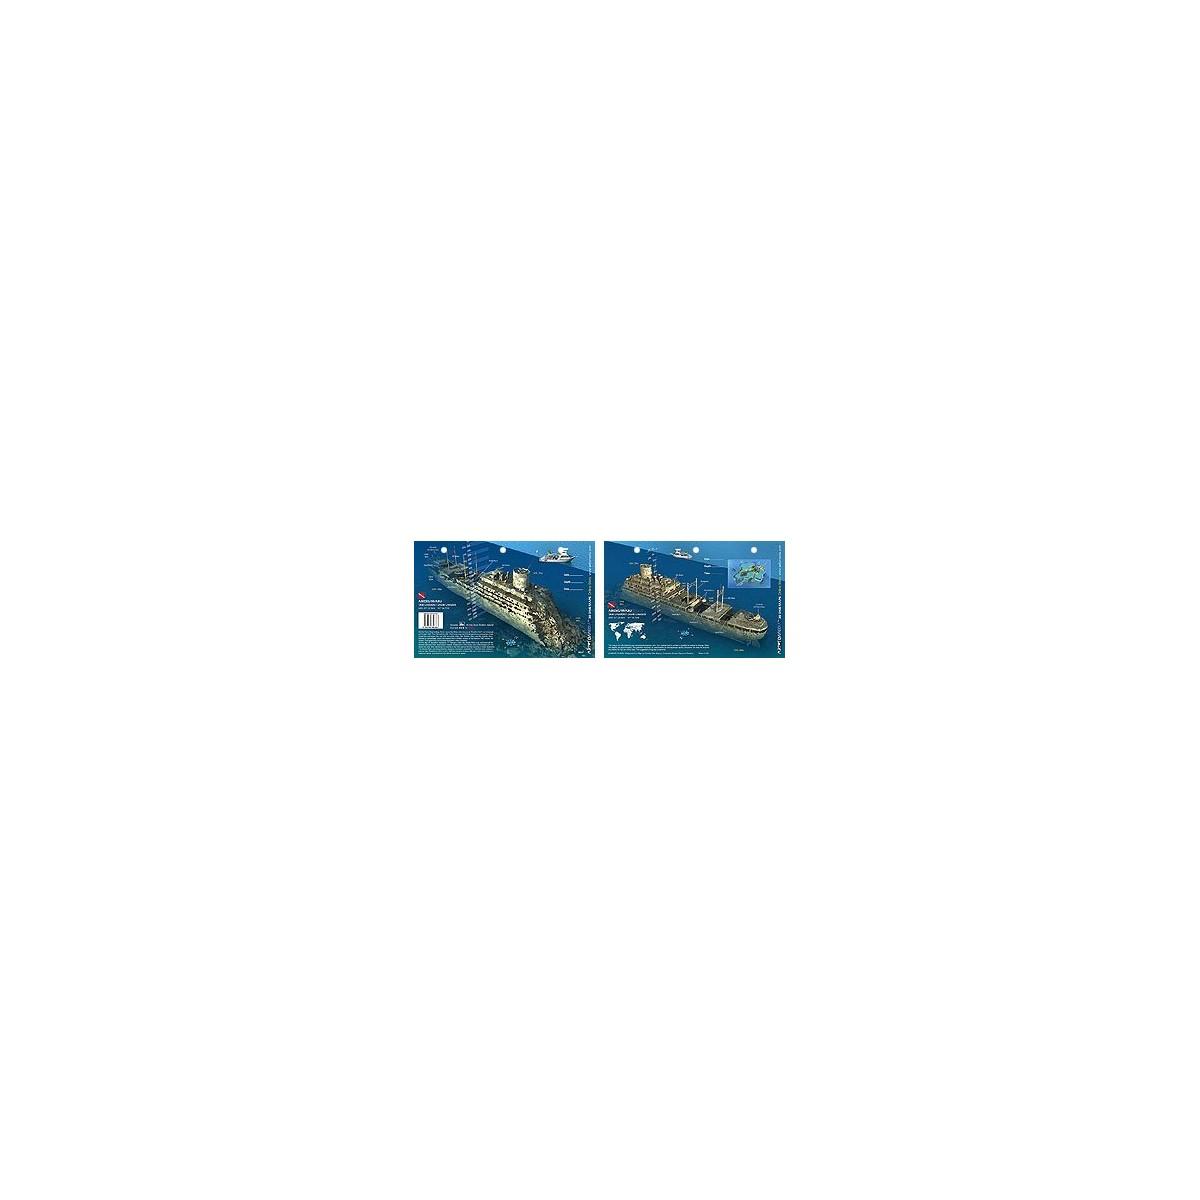 Aikoku Maru in Truk Lagoon, Micronesia (8.5 x 5.5 Inches) (21.6 x 15cm) - New Art to Media Underwater Waterproof 3D Dive Site Ma